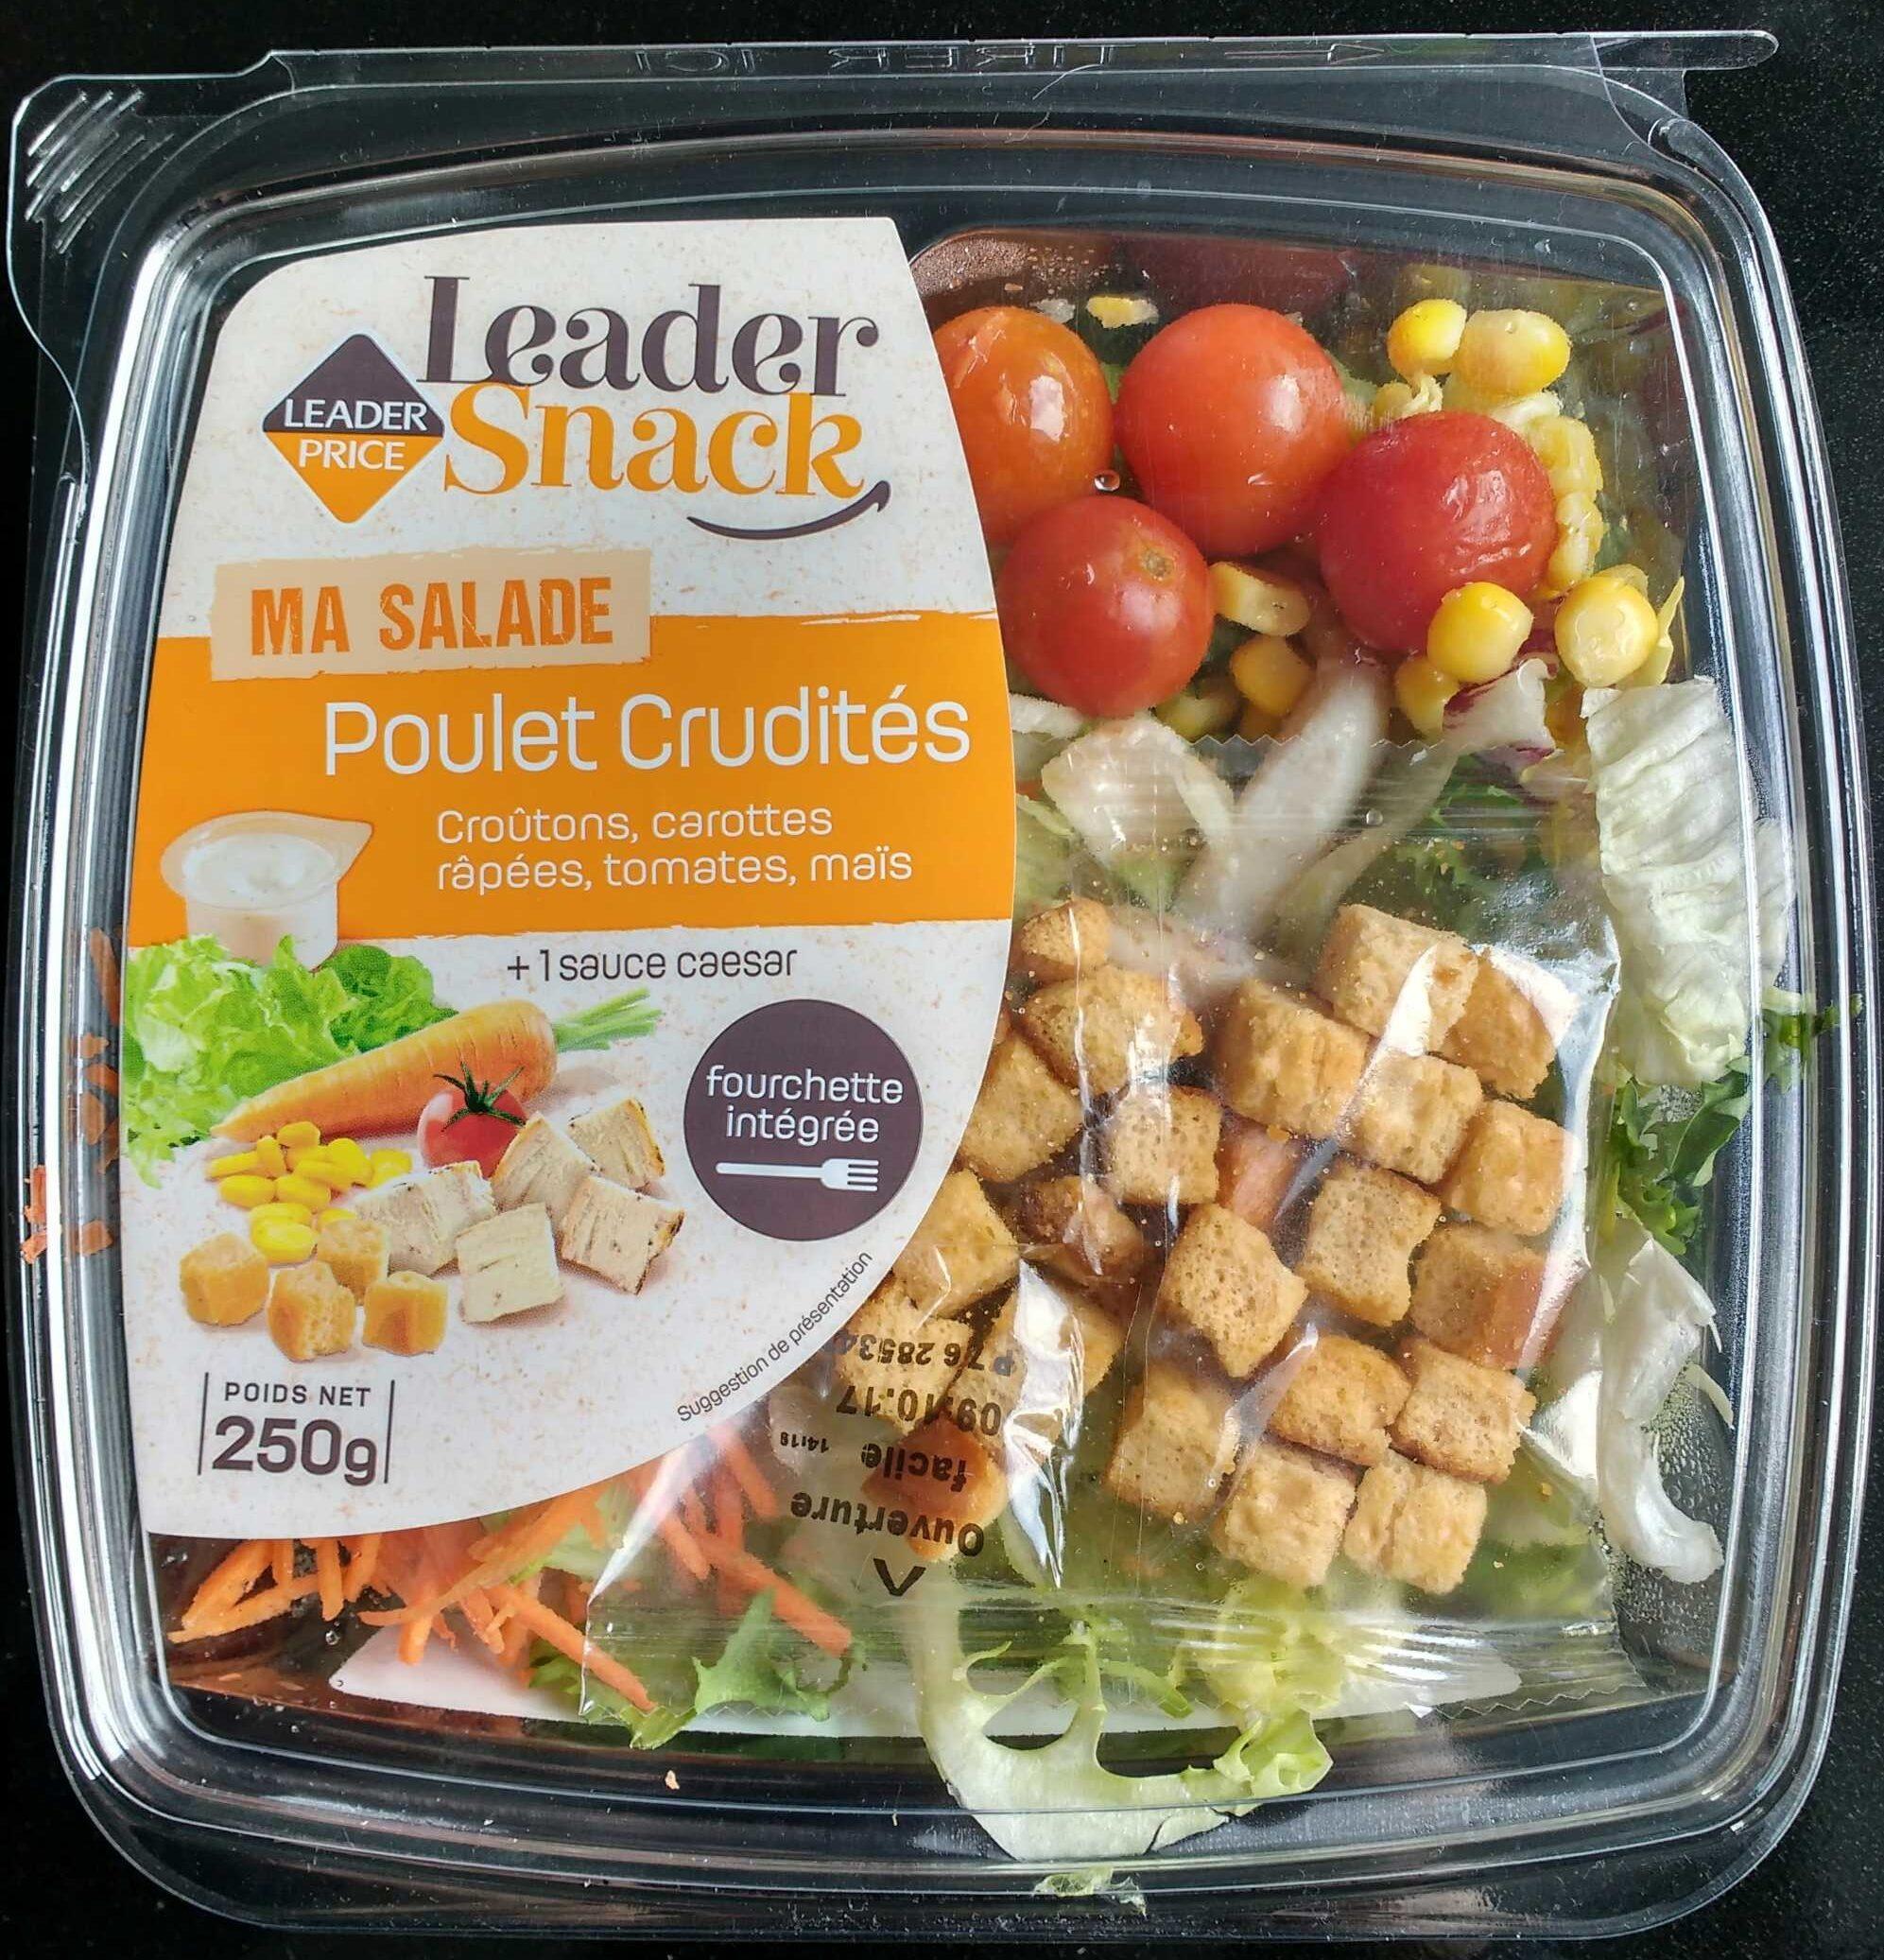 Salade poulet crudités - Produit - fr